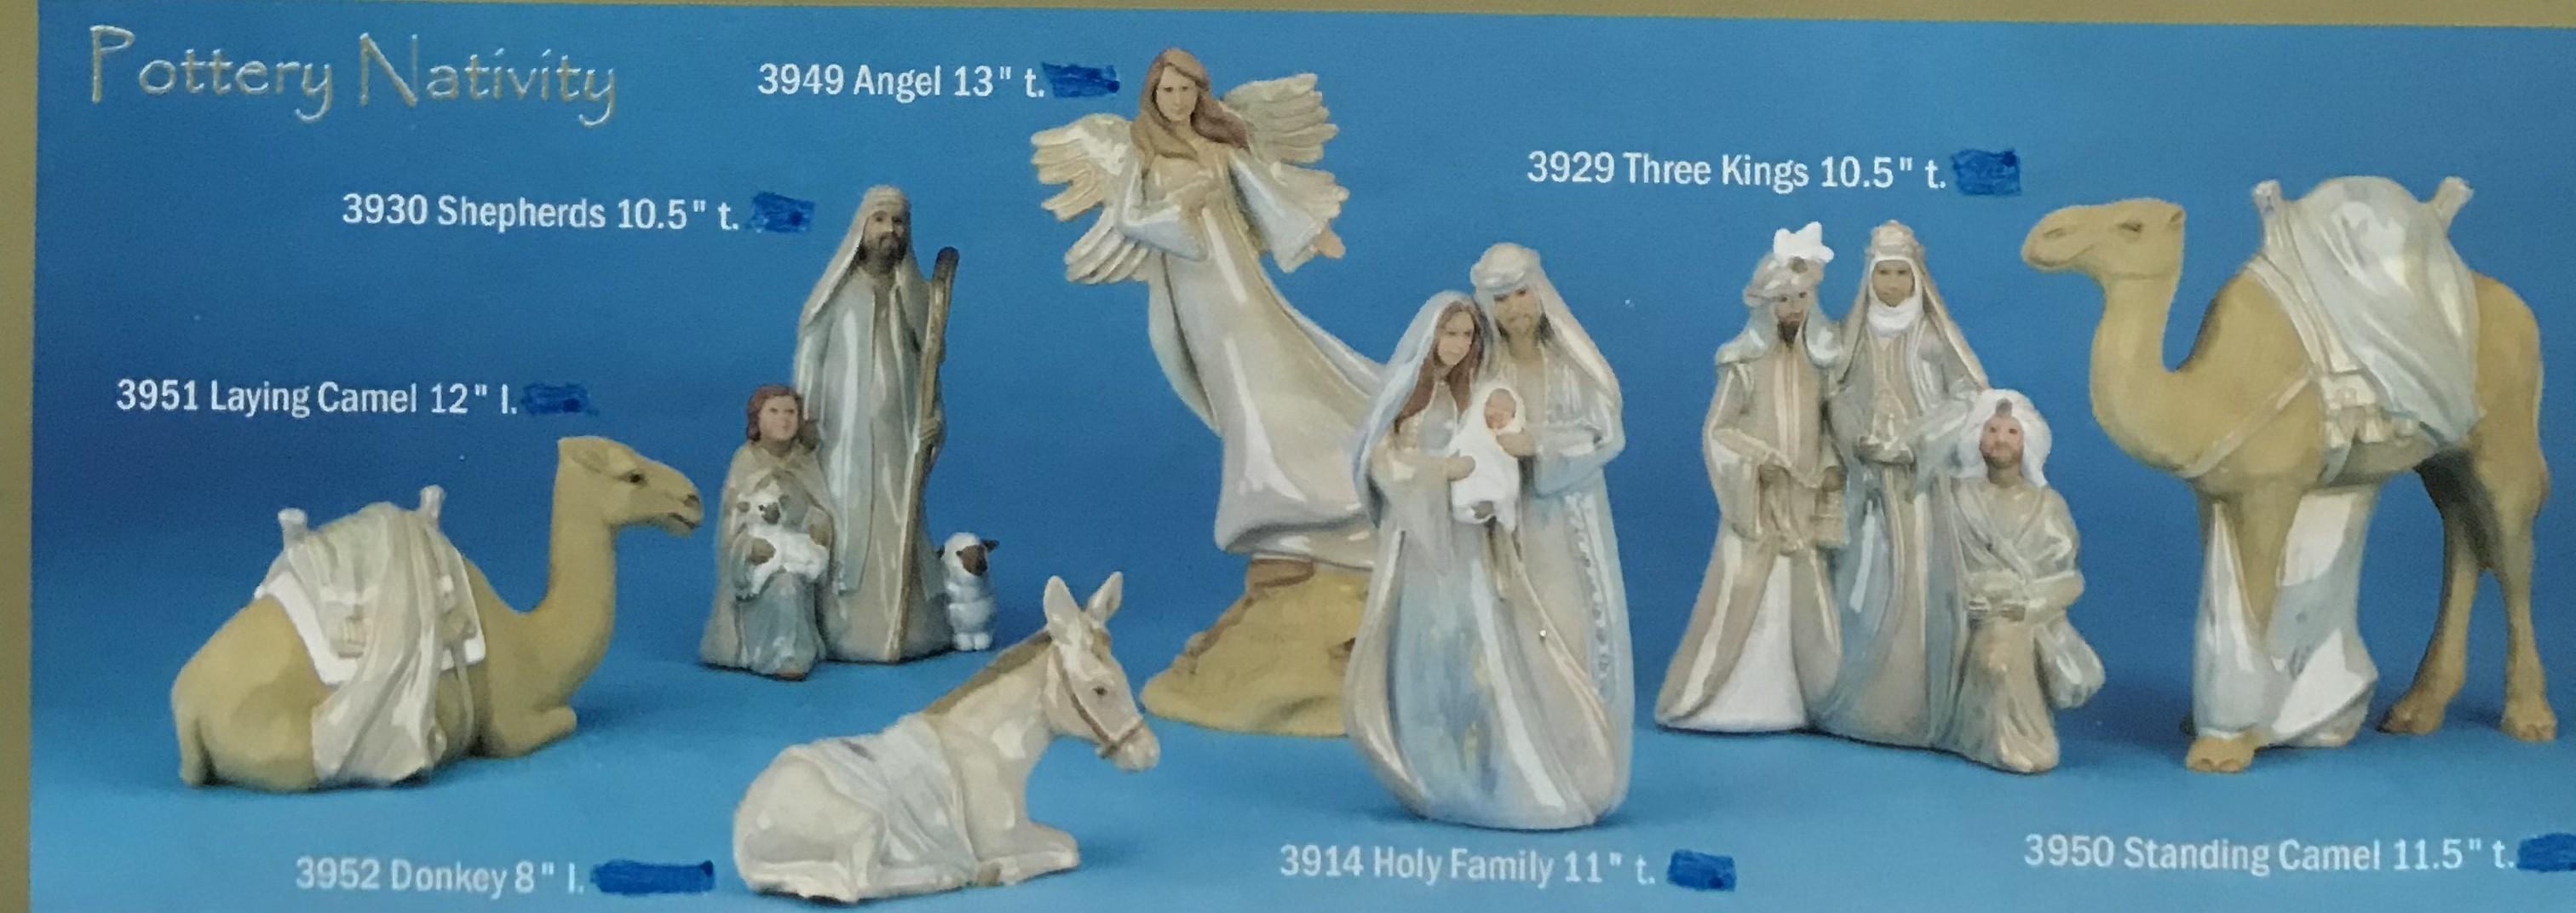 CPI Nativity Set